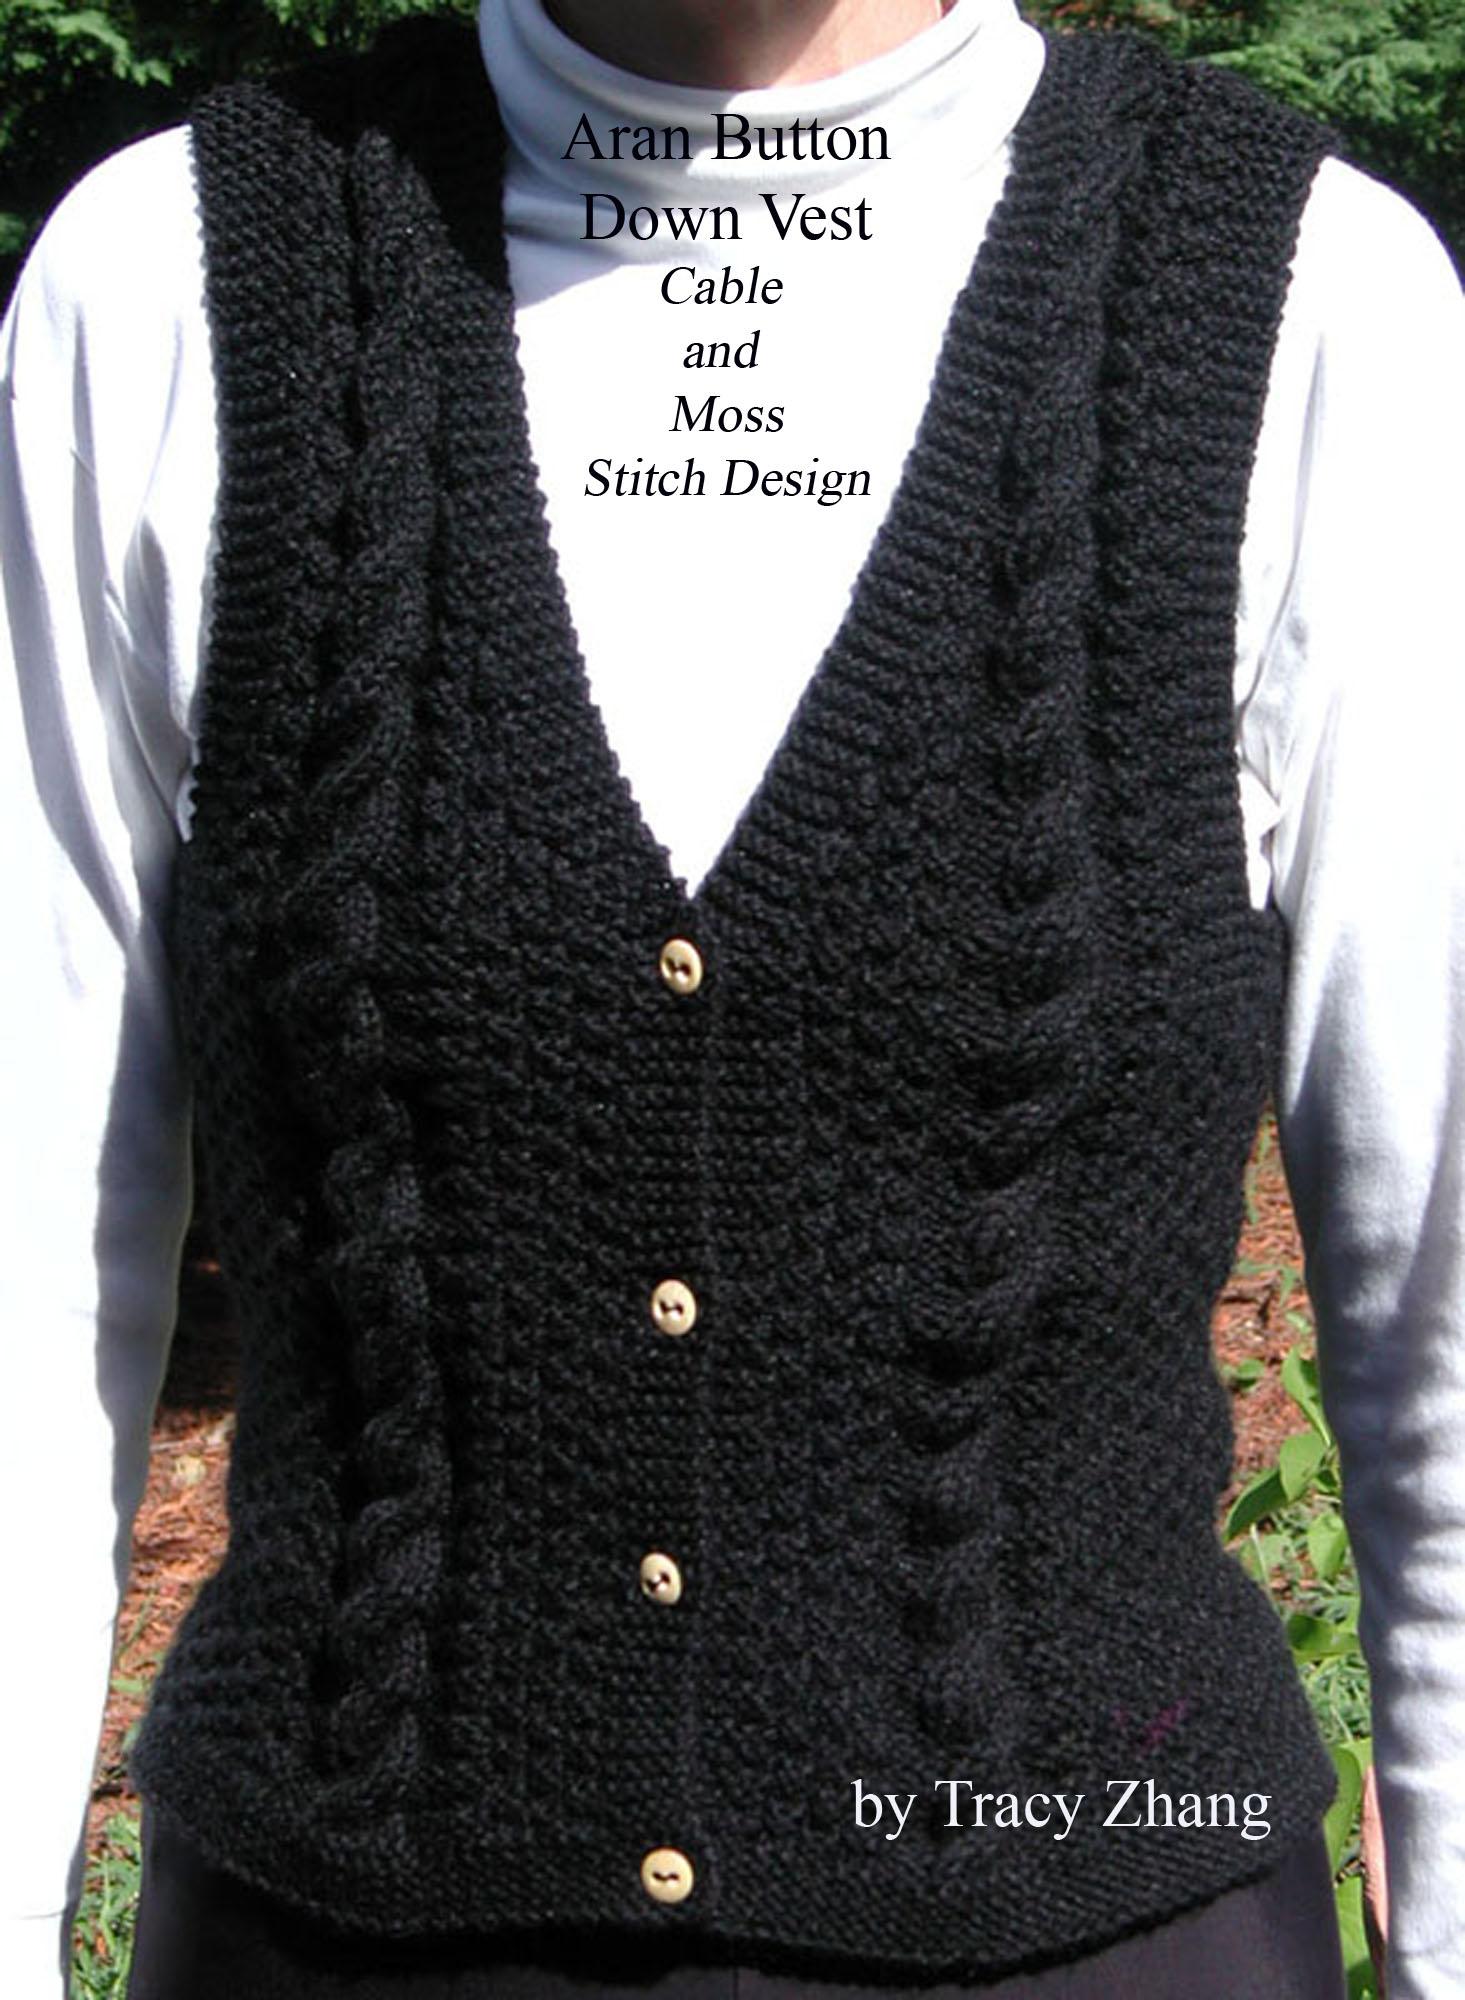 Smashwords Aran Button Down Vest Moss And Cable Stitch Design